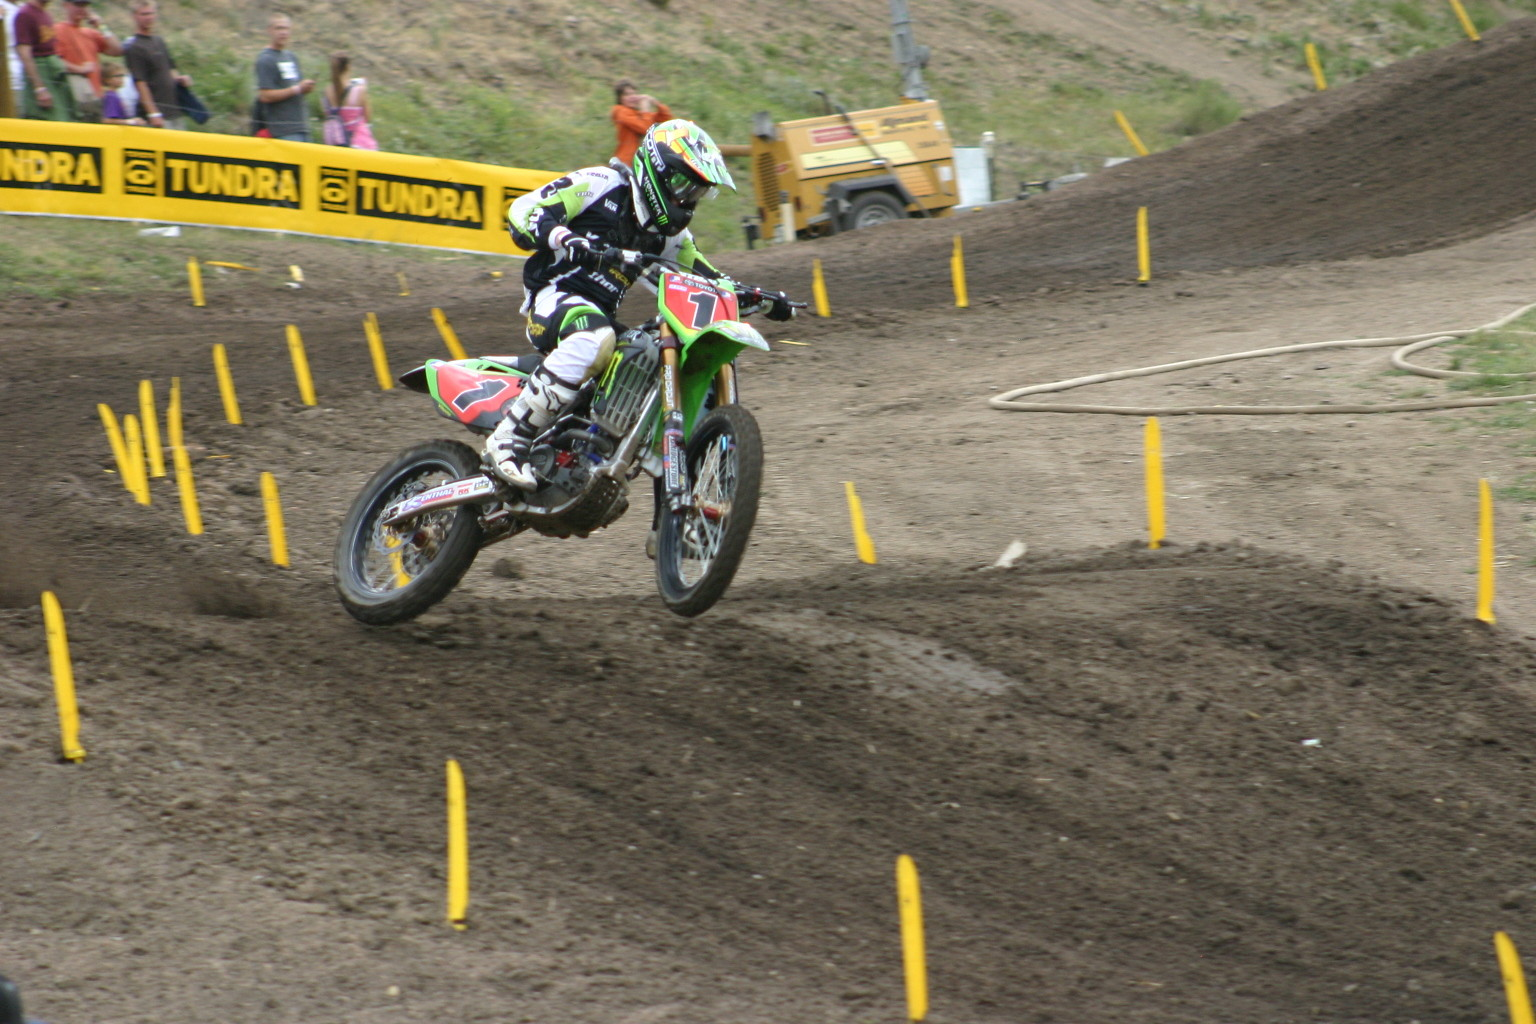 Villo 2 - jtomasik - Motocross Pictures - Vital MX